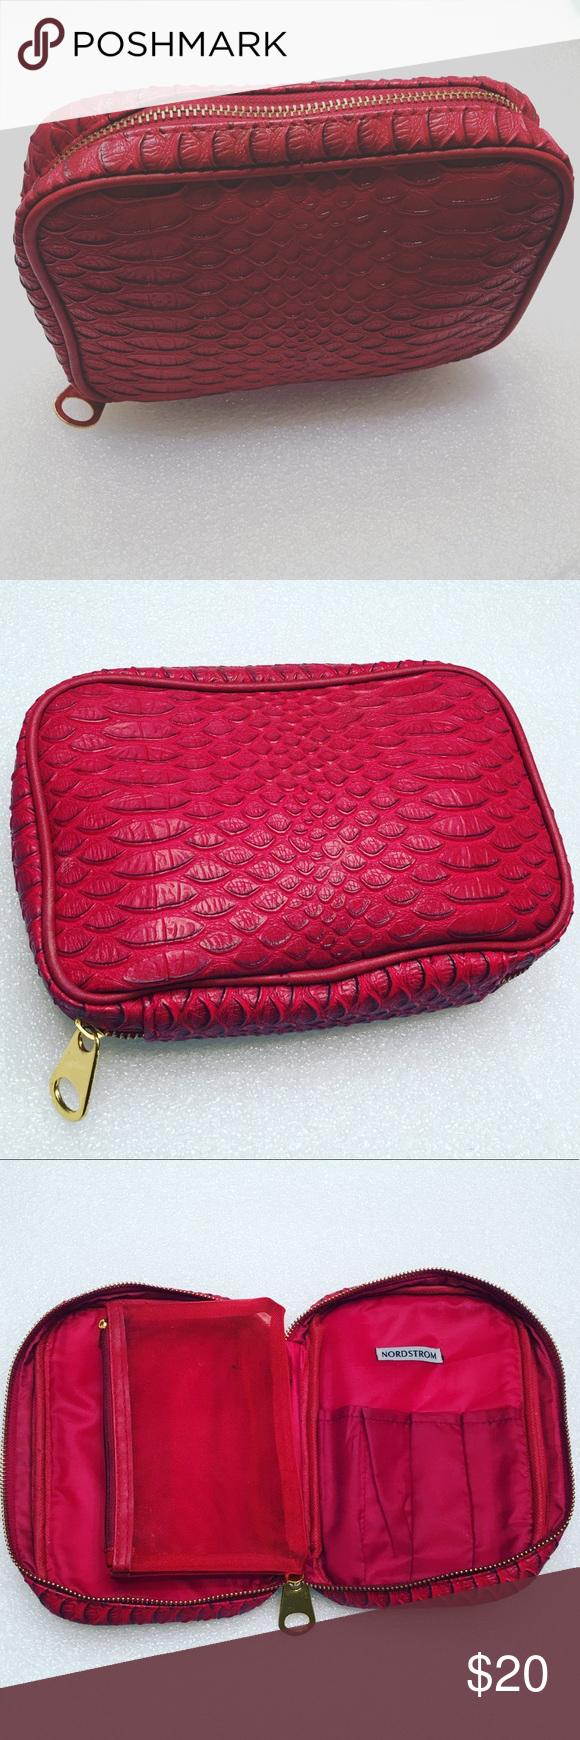 Nordstrom Makeup Bag Leather Red Gold Jumbo Zipper Beautiful Item Bags